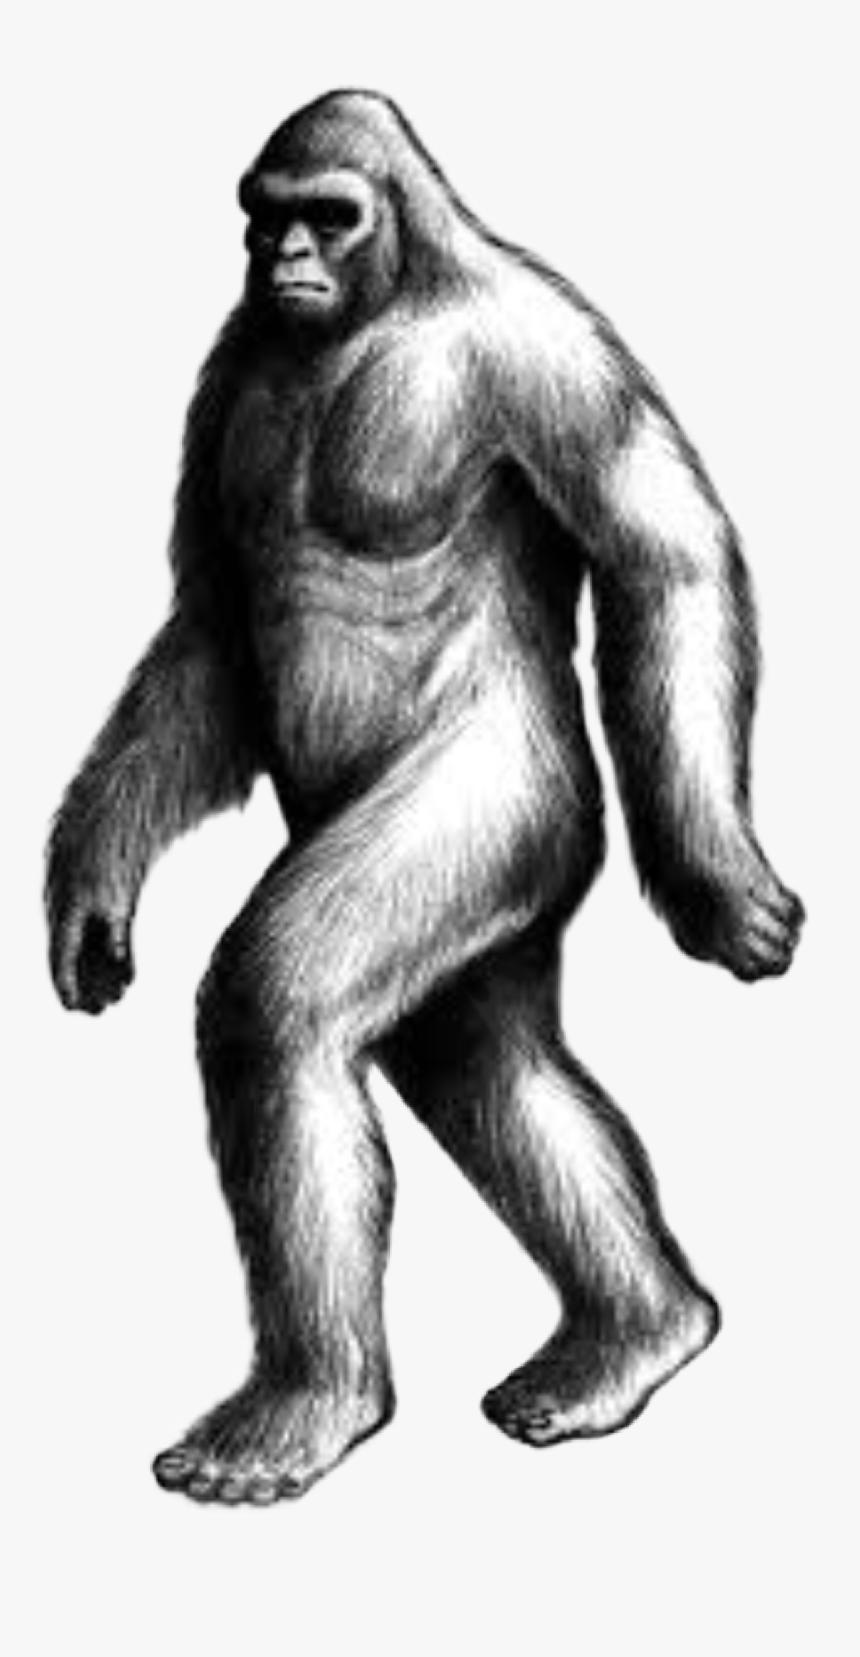 handdrawn #sasquatch #bigfoot #yowie #yeti #cryptid - Draw Sasquatch, HD Png Download - kindpng